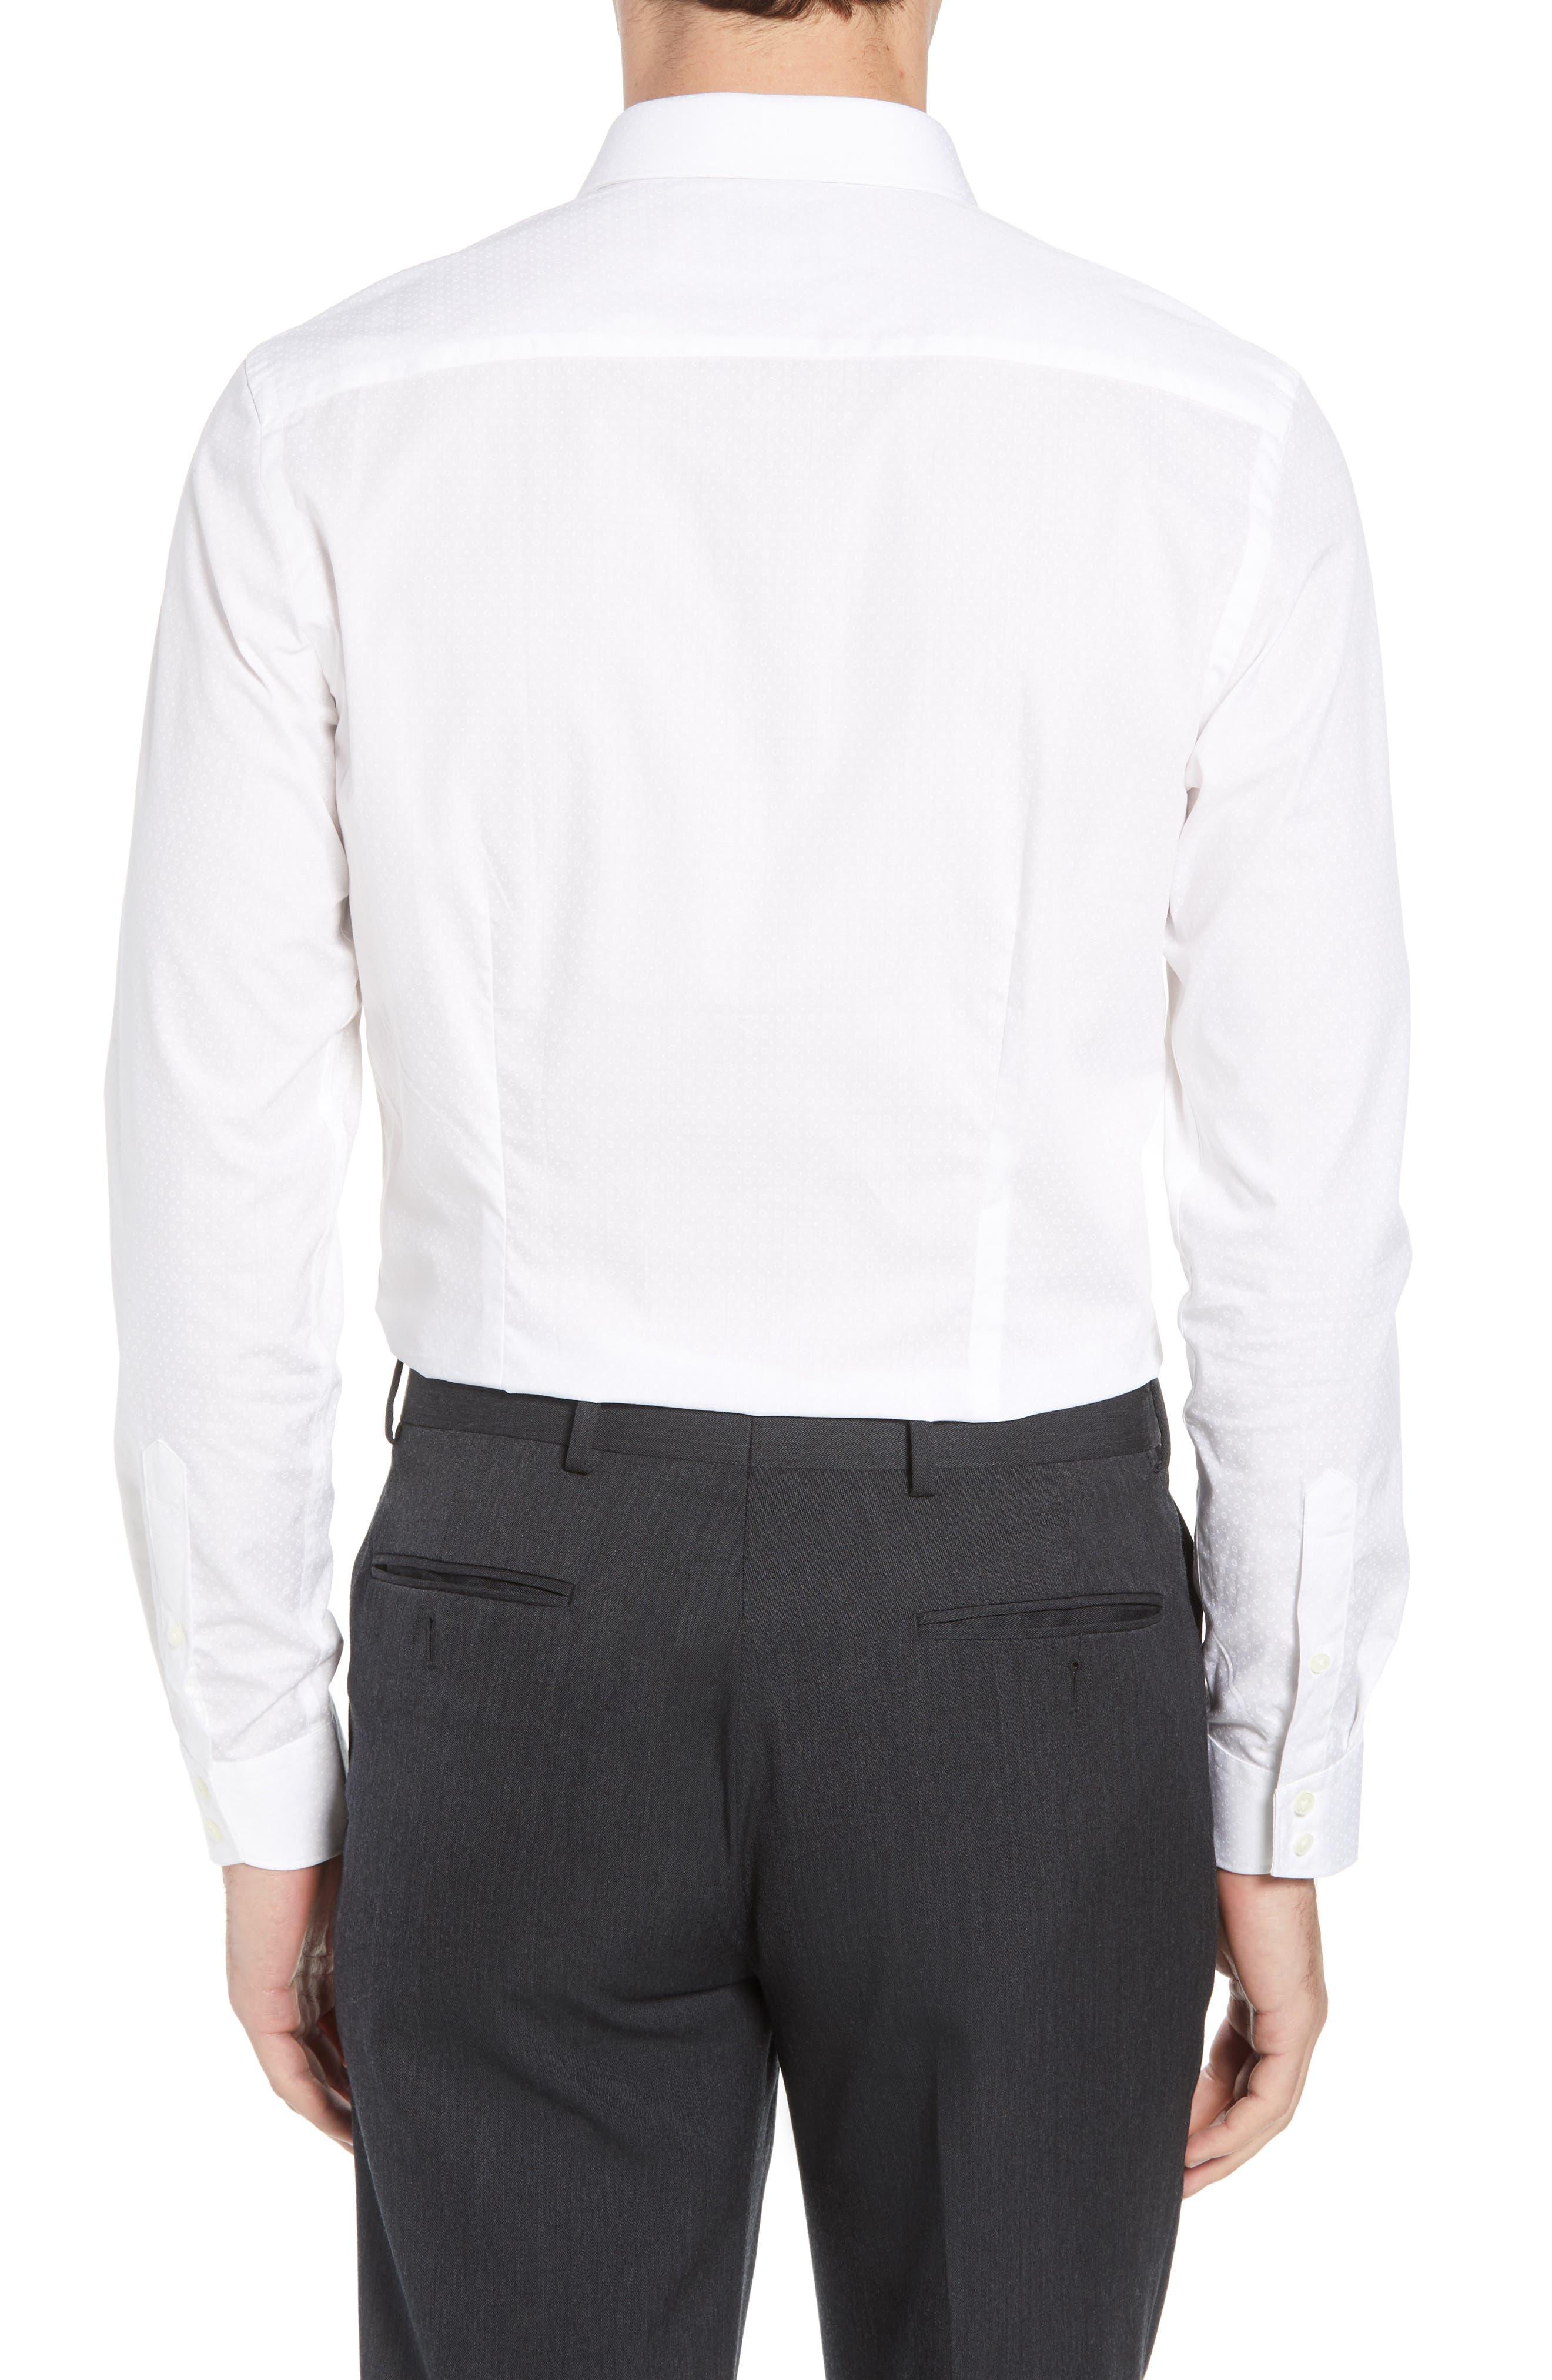 Loops Slim Fit Dress Shirt,                             Alternate thumbnail 3, color,                             110